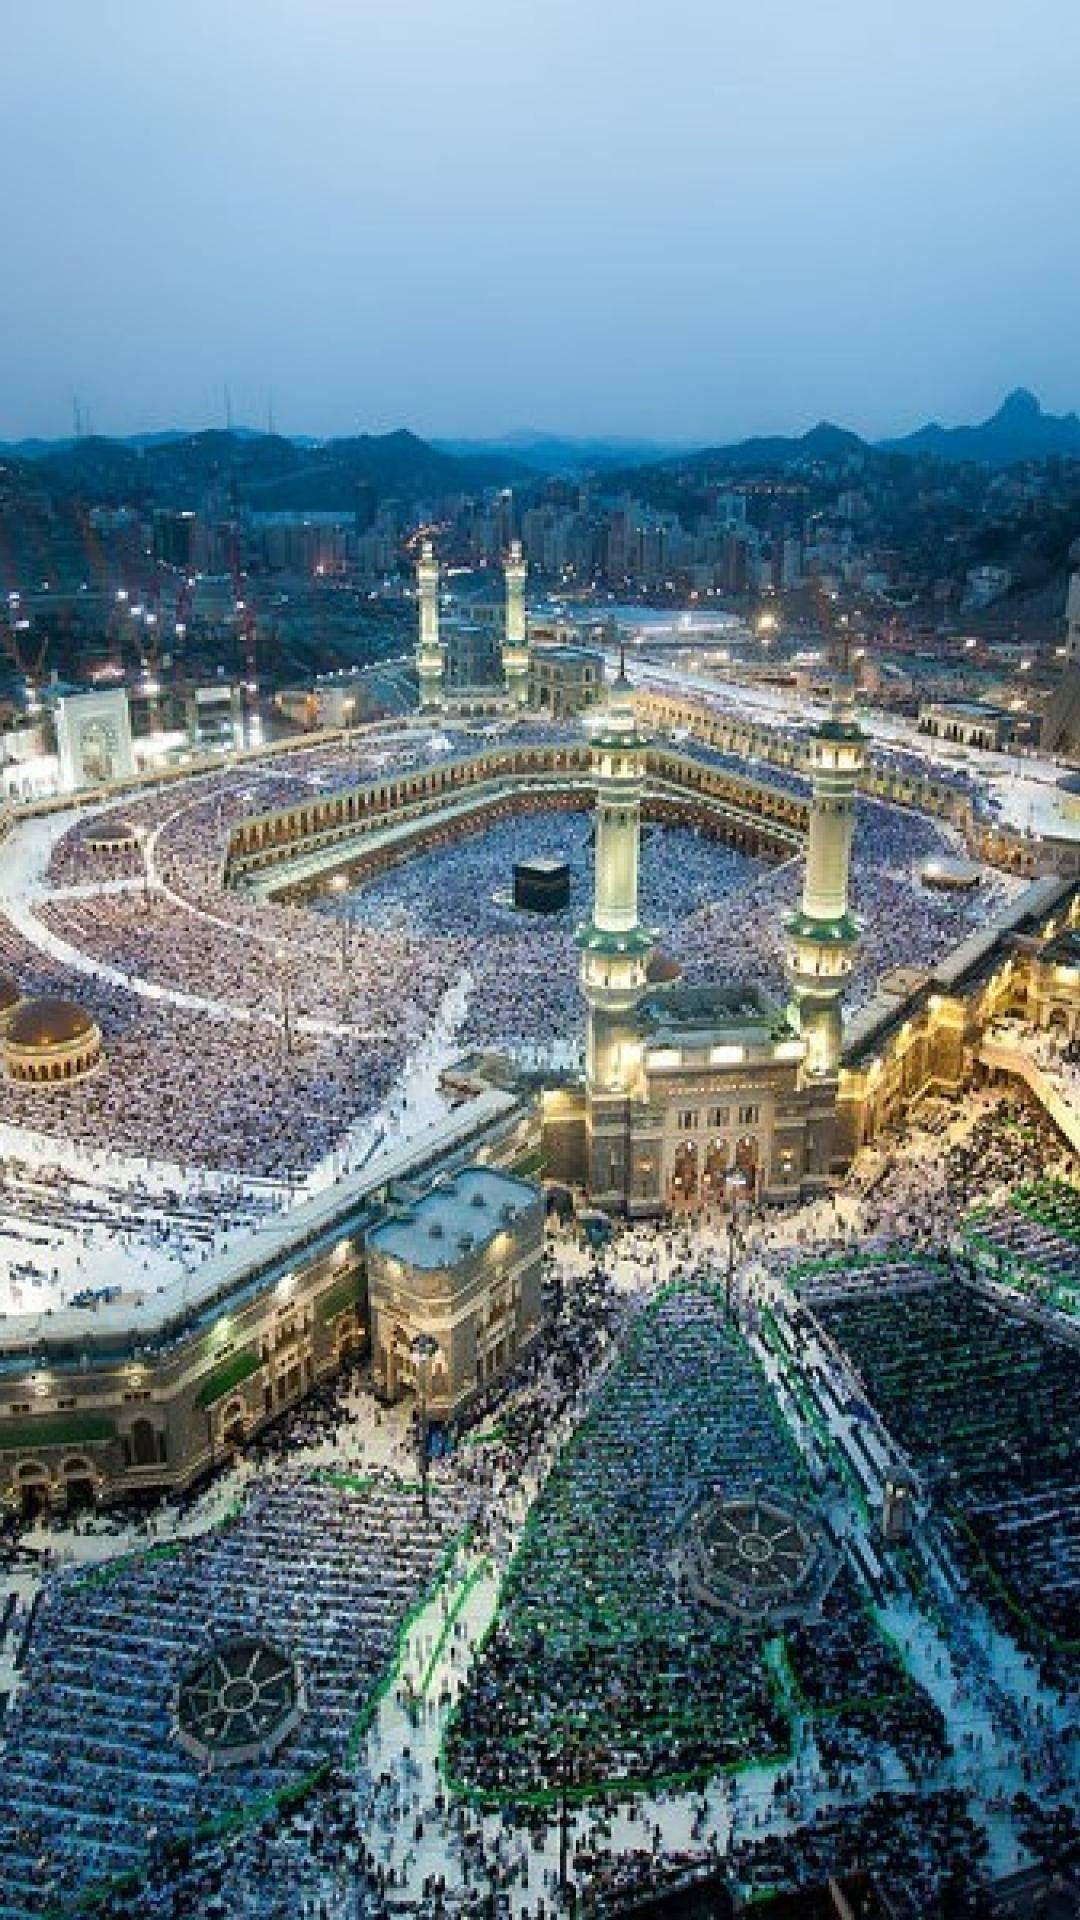 Mecca Hd Wallpaper 70 Images In 2020 Mecca Wallpaper Mecca Beautiful Mosques